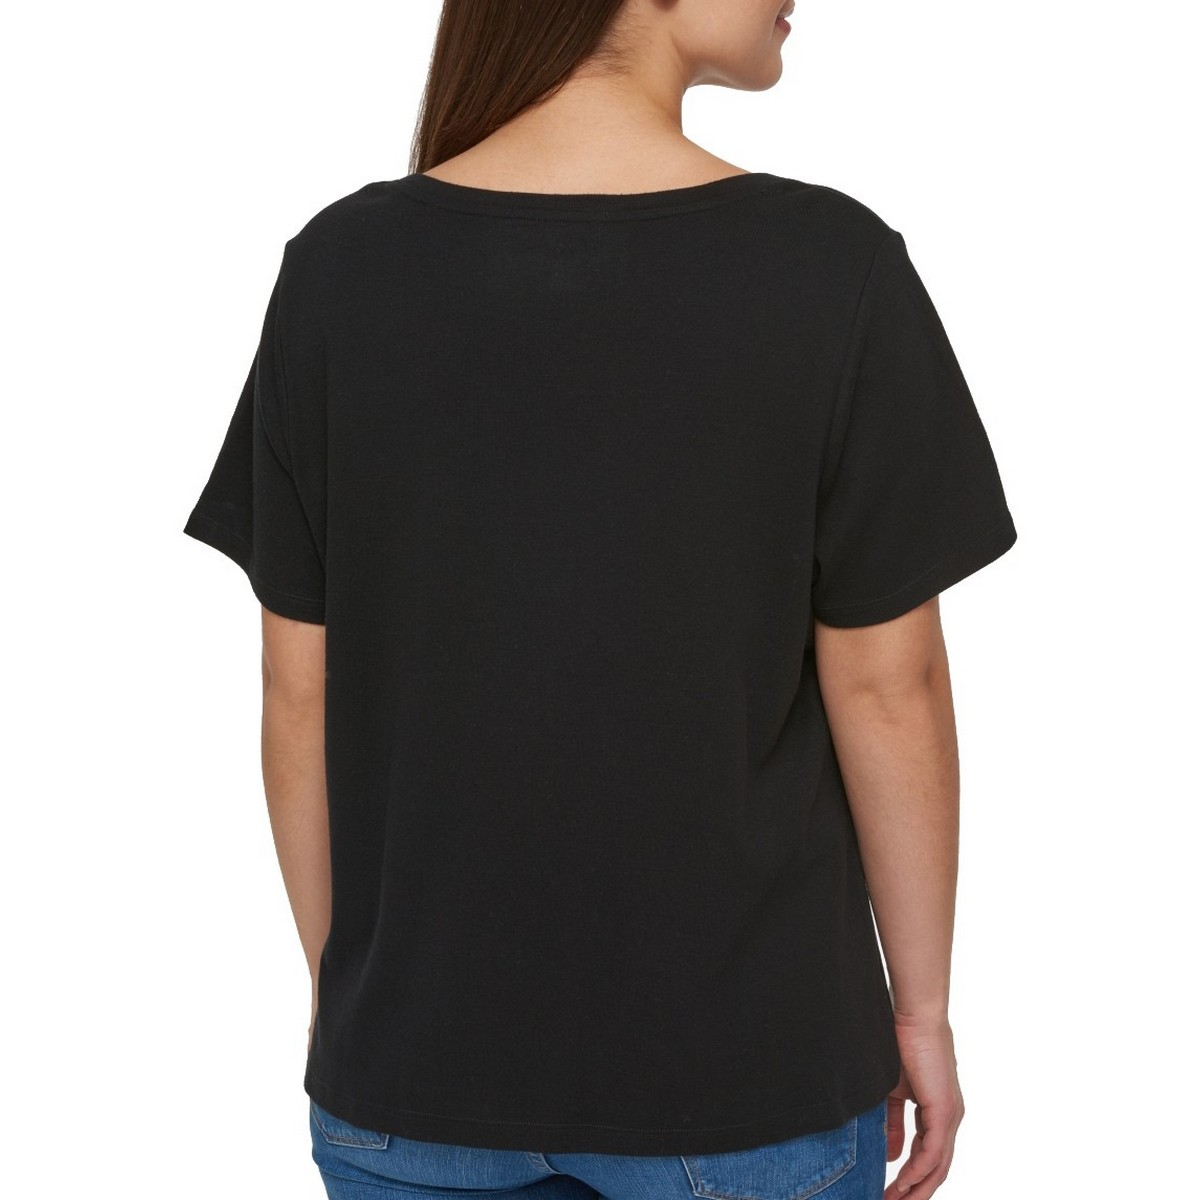 TOMMY-HILFIGER-NEW-Women-039-s-Plus-Size-Cotton-Logo-Print-Casual-Shirt-Top-TEDO thumbnail 4